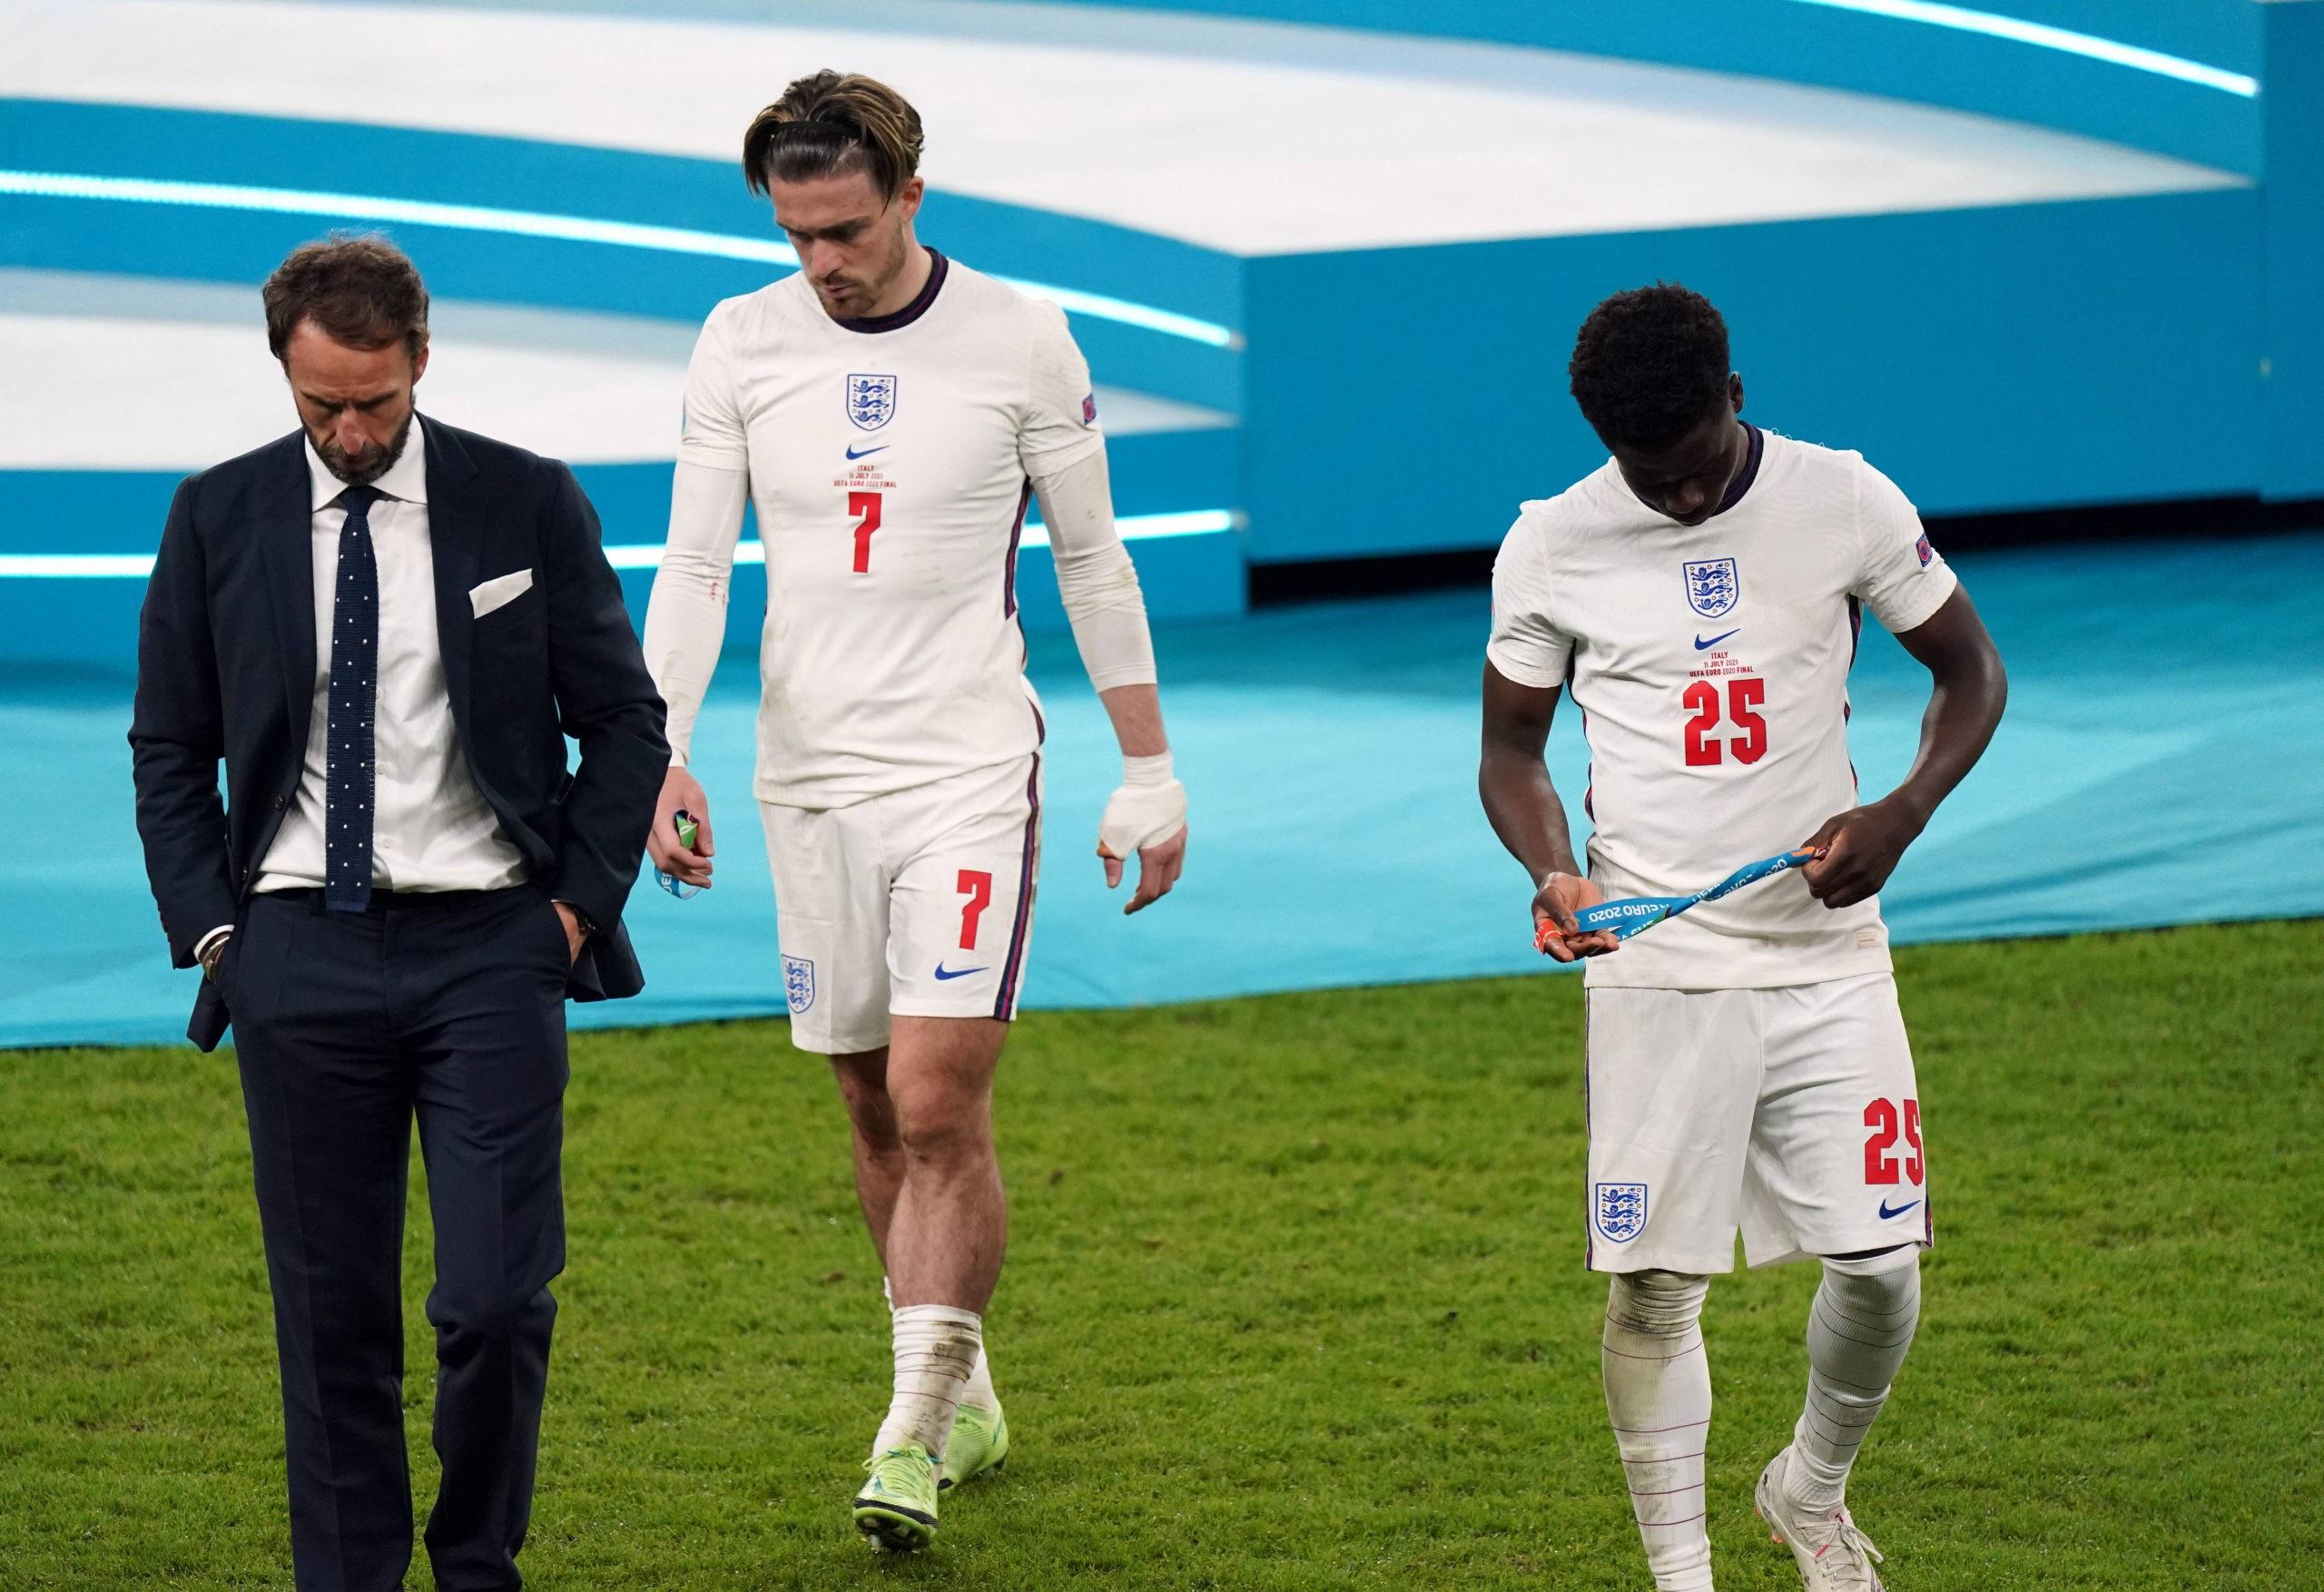 Italy v England - UEFA EURO 2020 Final - Gareth Southgate stands dejected alongside Bukayo Saka and Jack Grealish following the UEFA Euro 2020 Final at Wembley Stadium, London. Picture date: Sunday, July 11, 2021. Copyright: Mike Egerton